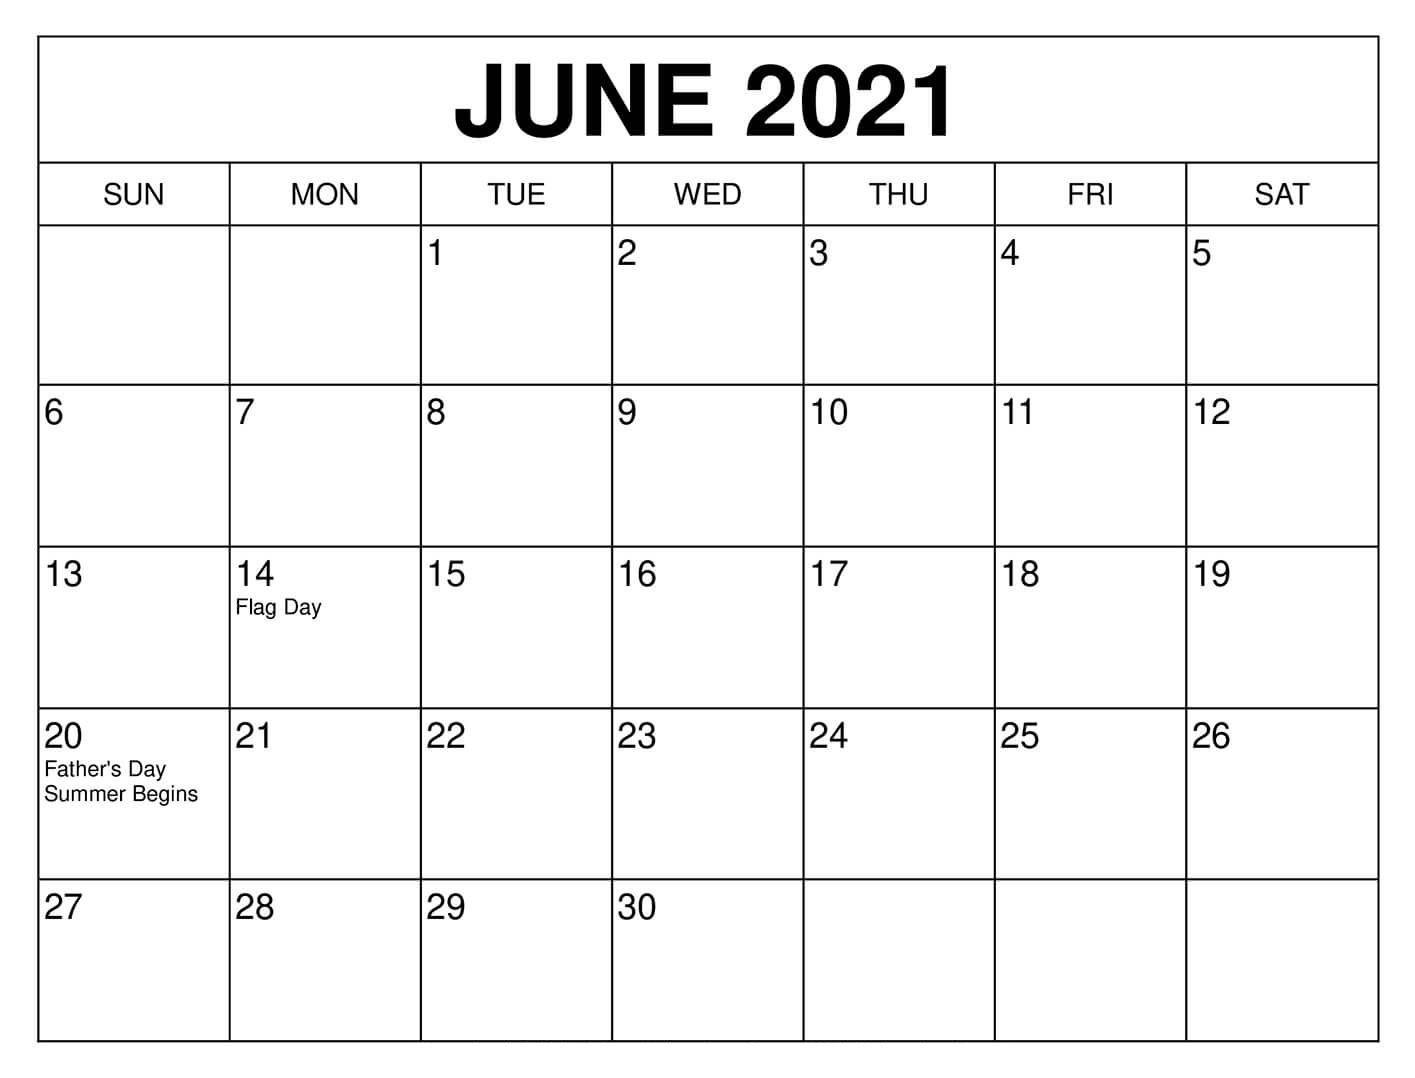 June 2021 Calendar – Free Calendar Template with Holidays